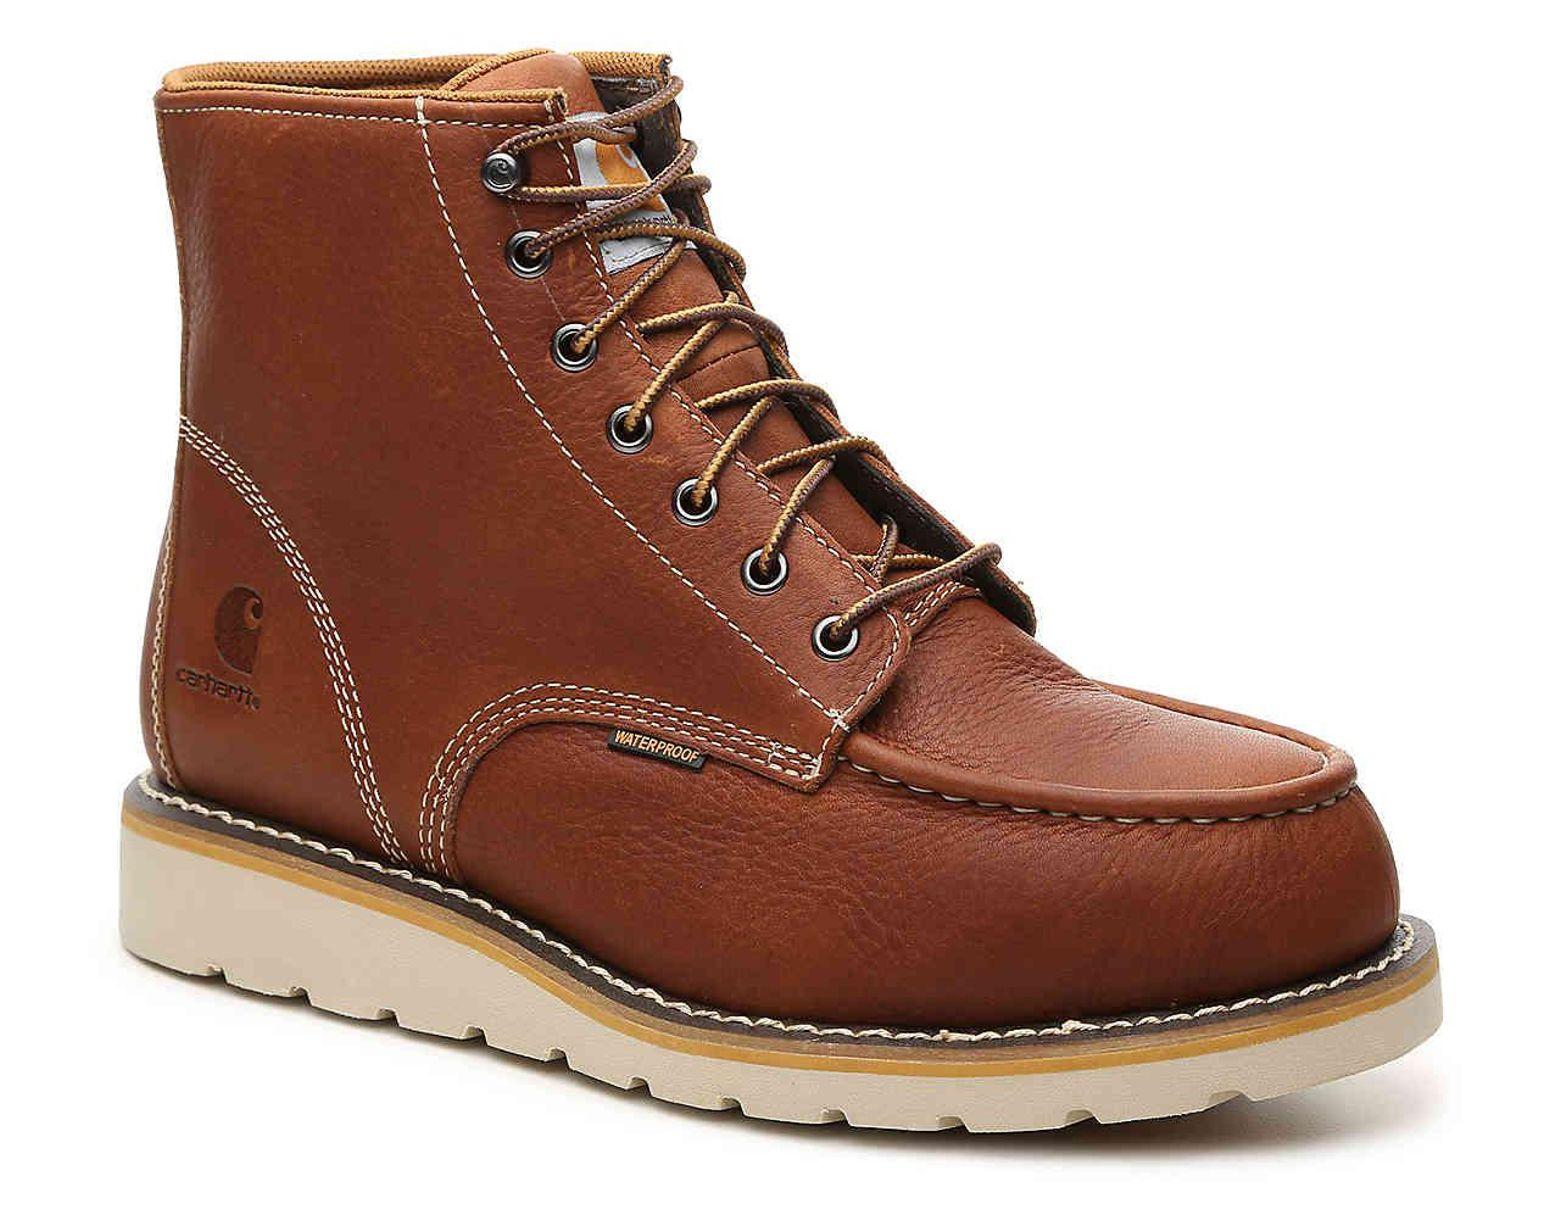 b8f3ed82fbf Men's Brown 6-inch Wedge Work Boot